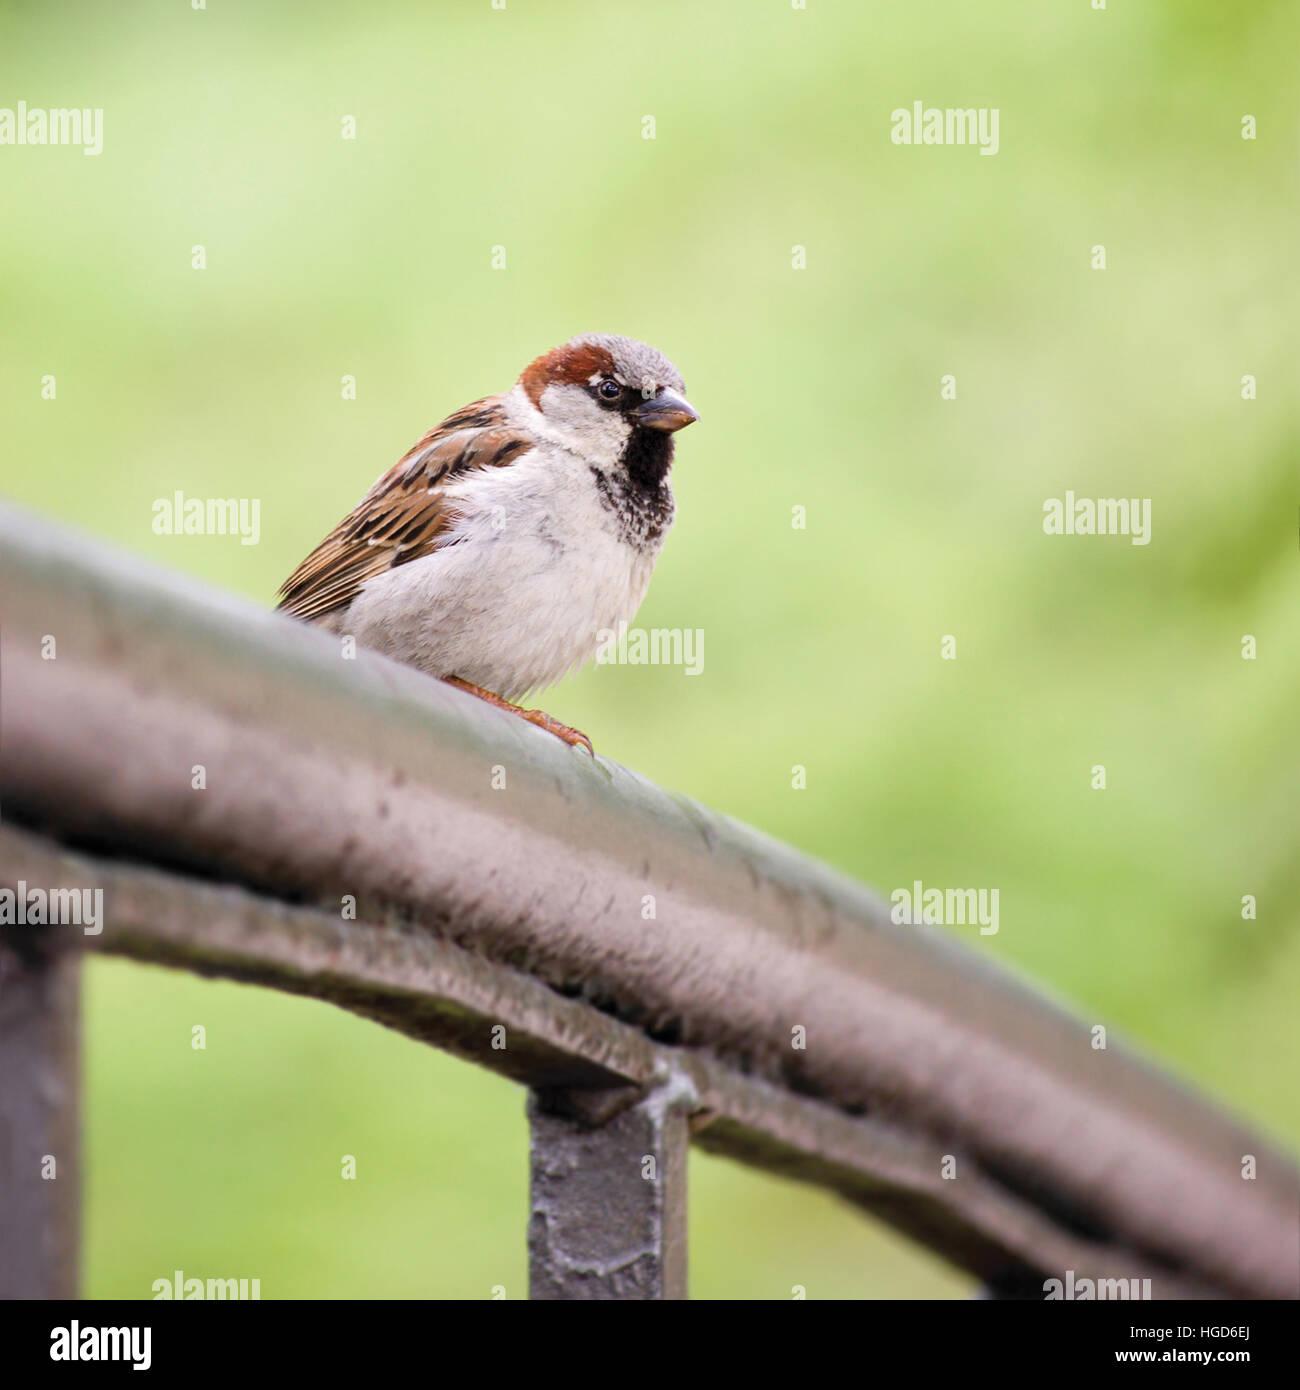 Sparrow Bird Passer domesticus On Bridge Rail, Closeup, Large Detailed Stock Photo